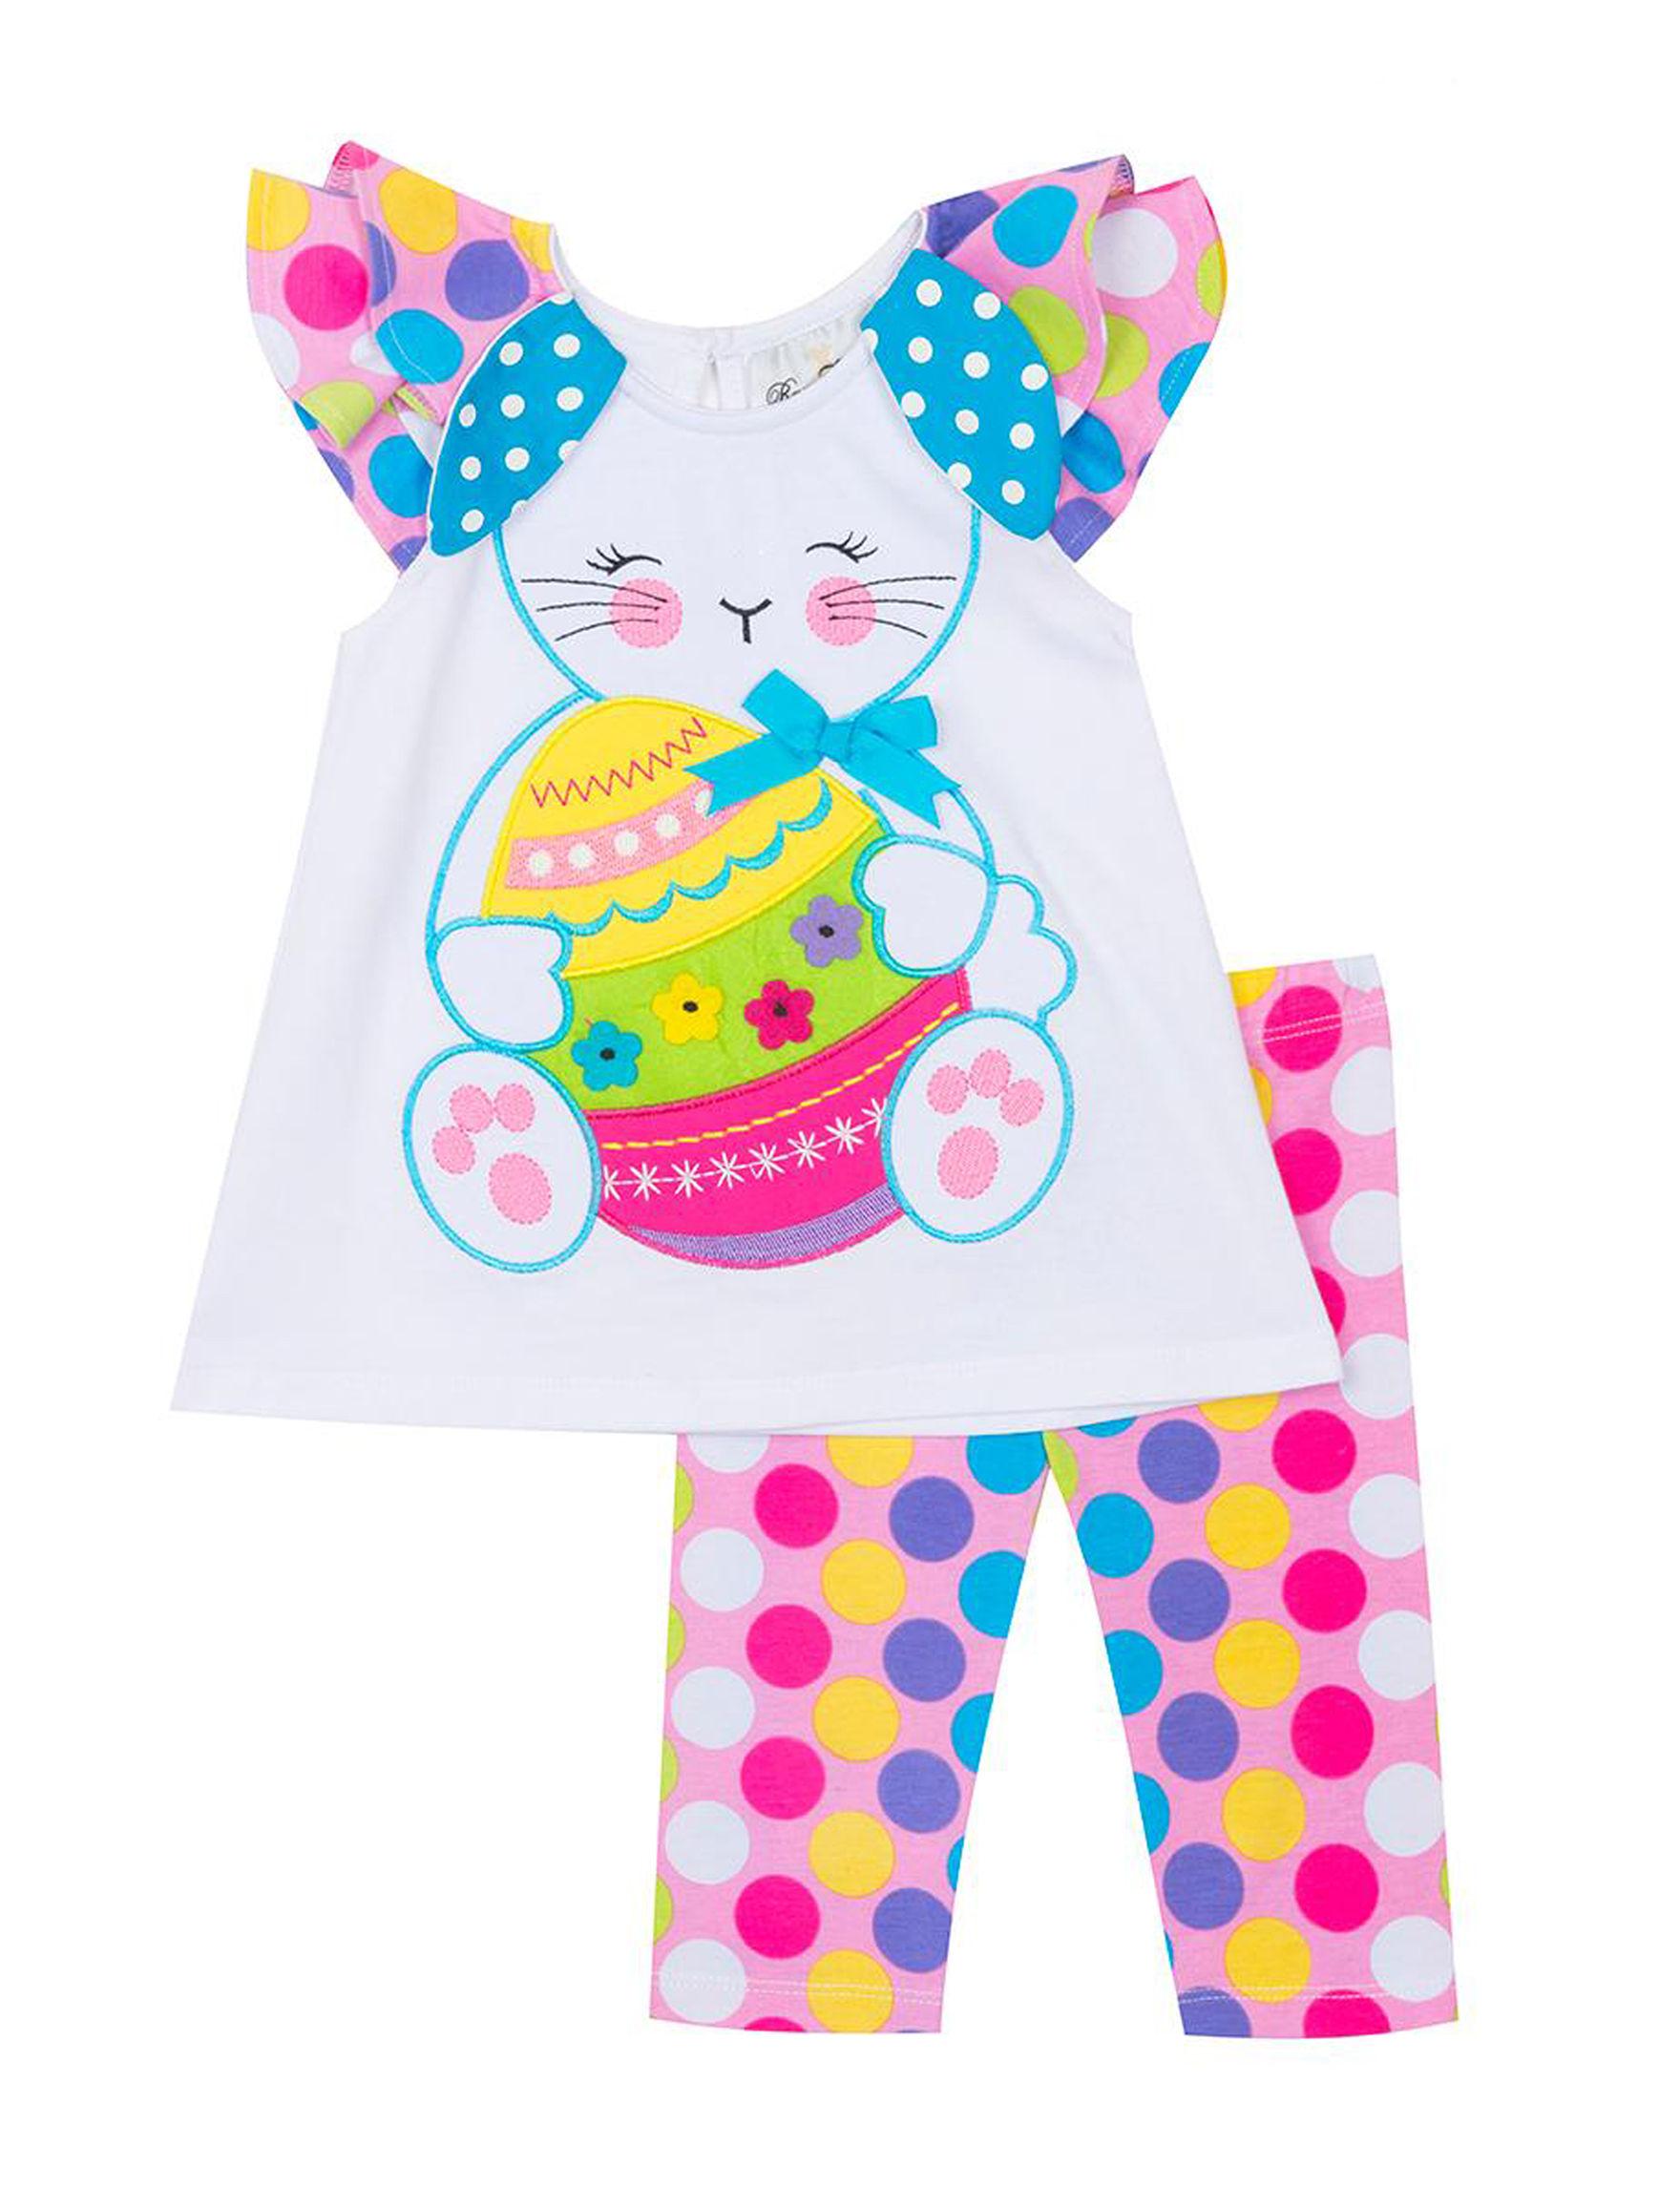 d82e575e94b8 Rare Editions 2-pc. Easter Bunny Polka-Dot Top & Capri Pants Set - Toddlers  & Girls 5-6x